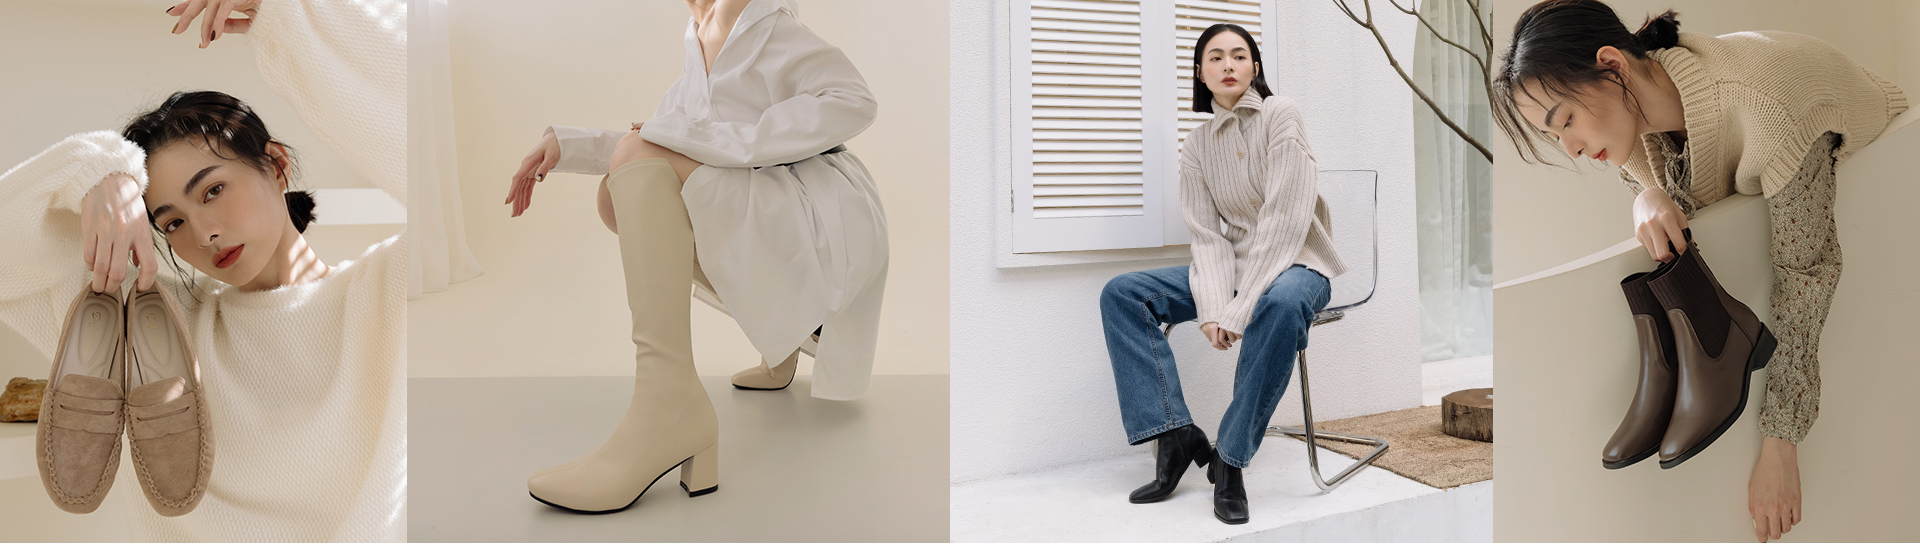 D+AF 女靴(鞋)推薦 短靴 白色長靴 襪靴 樂福鞋 2021